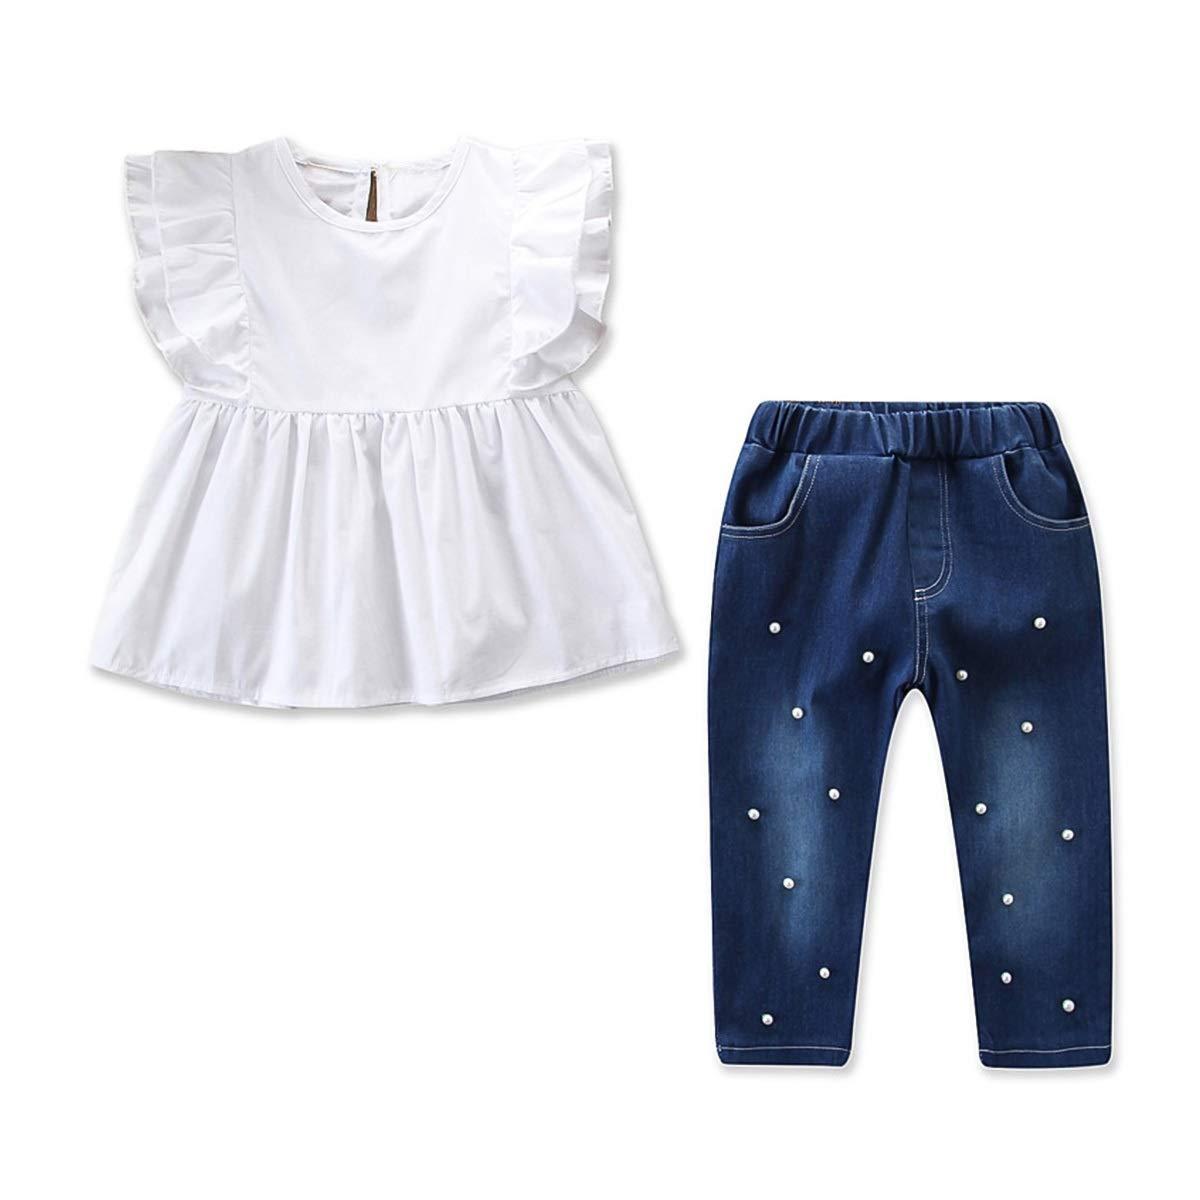 Beading Pants Outfits 2pcs Kids Girl Fashion Clothes Set Ruffles Shirt Top